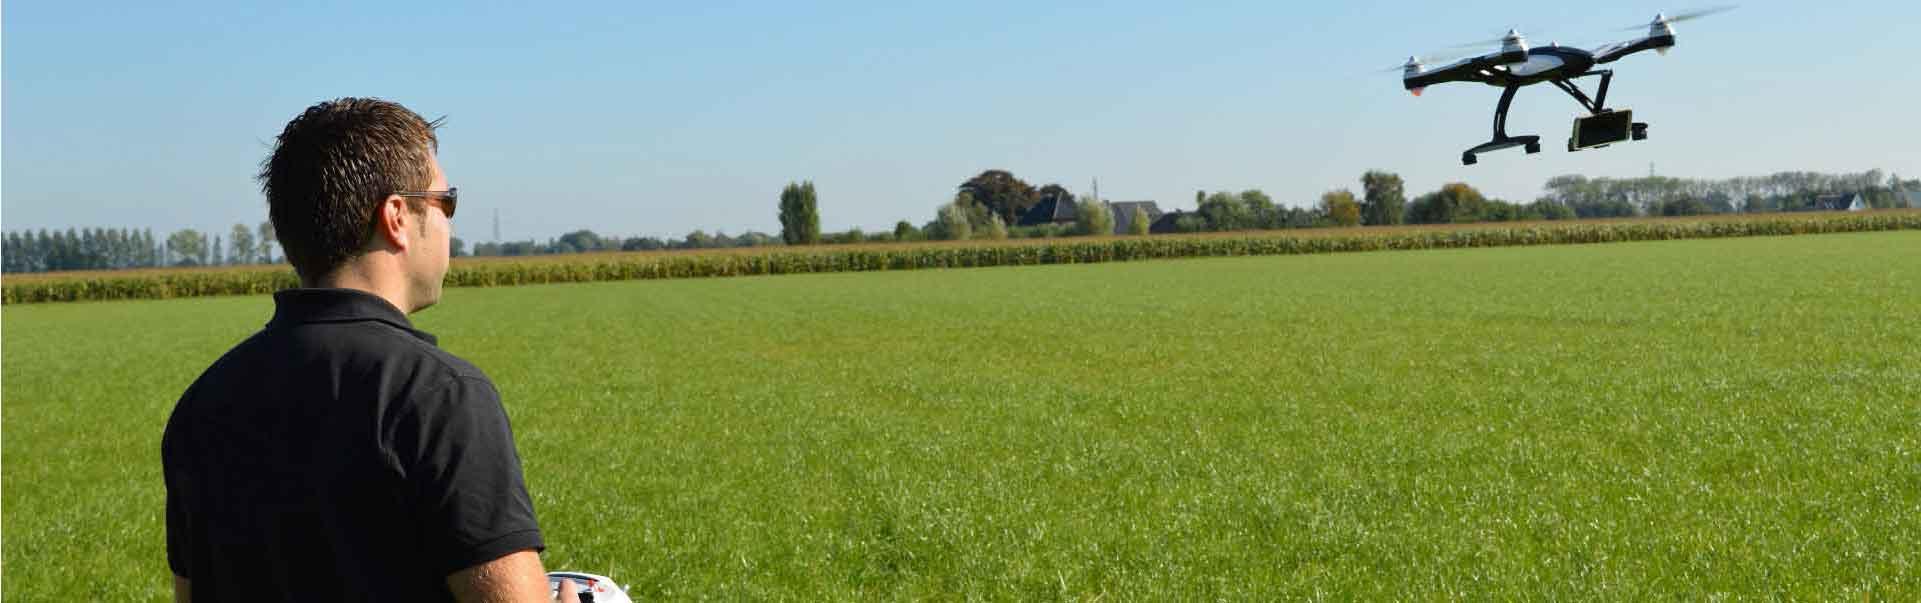 Drone vliegen | Bedrijfsuitjes in Twente